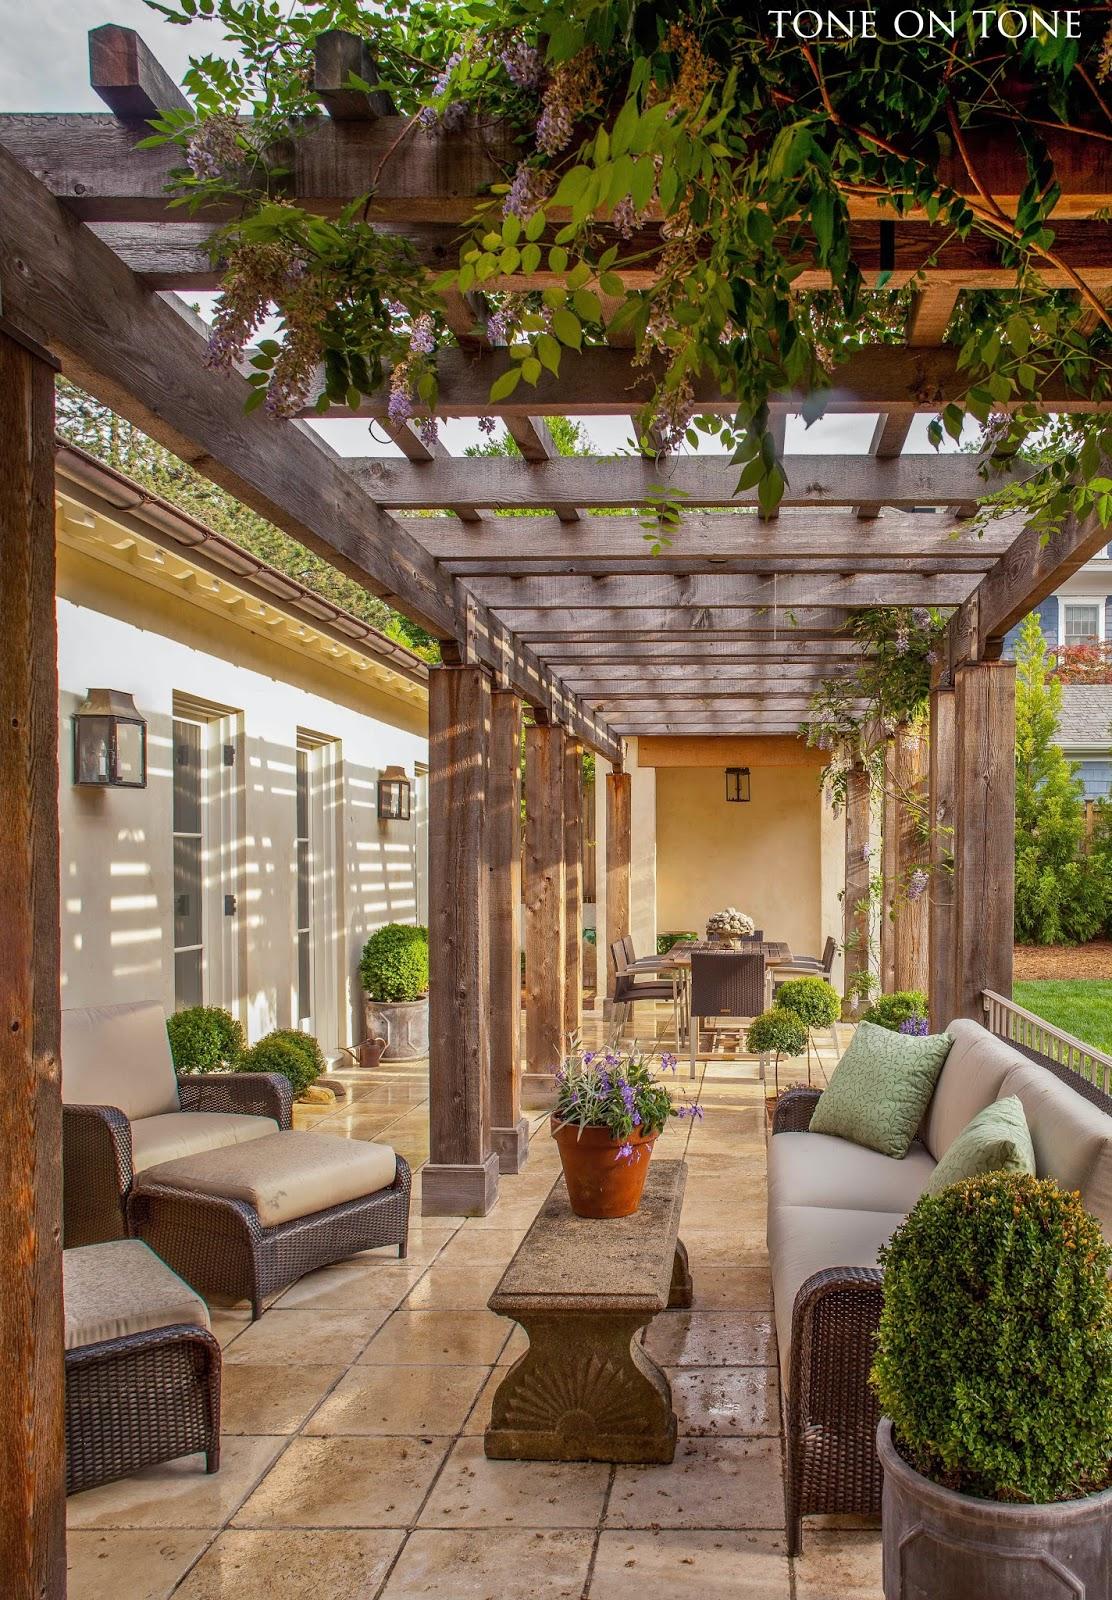 Tone On Tone Interior Amp Garden Design January 2015